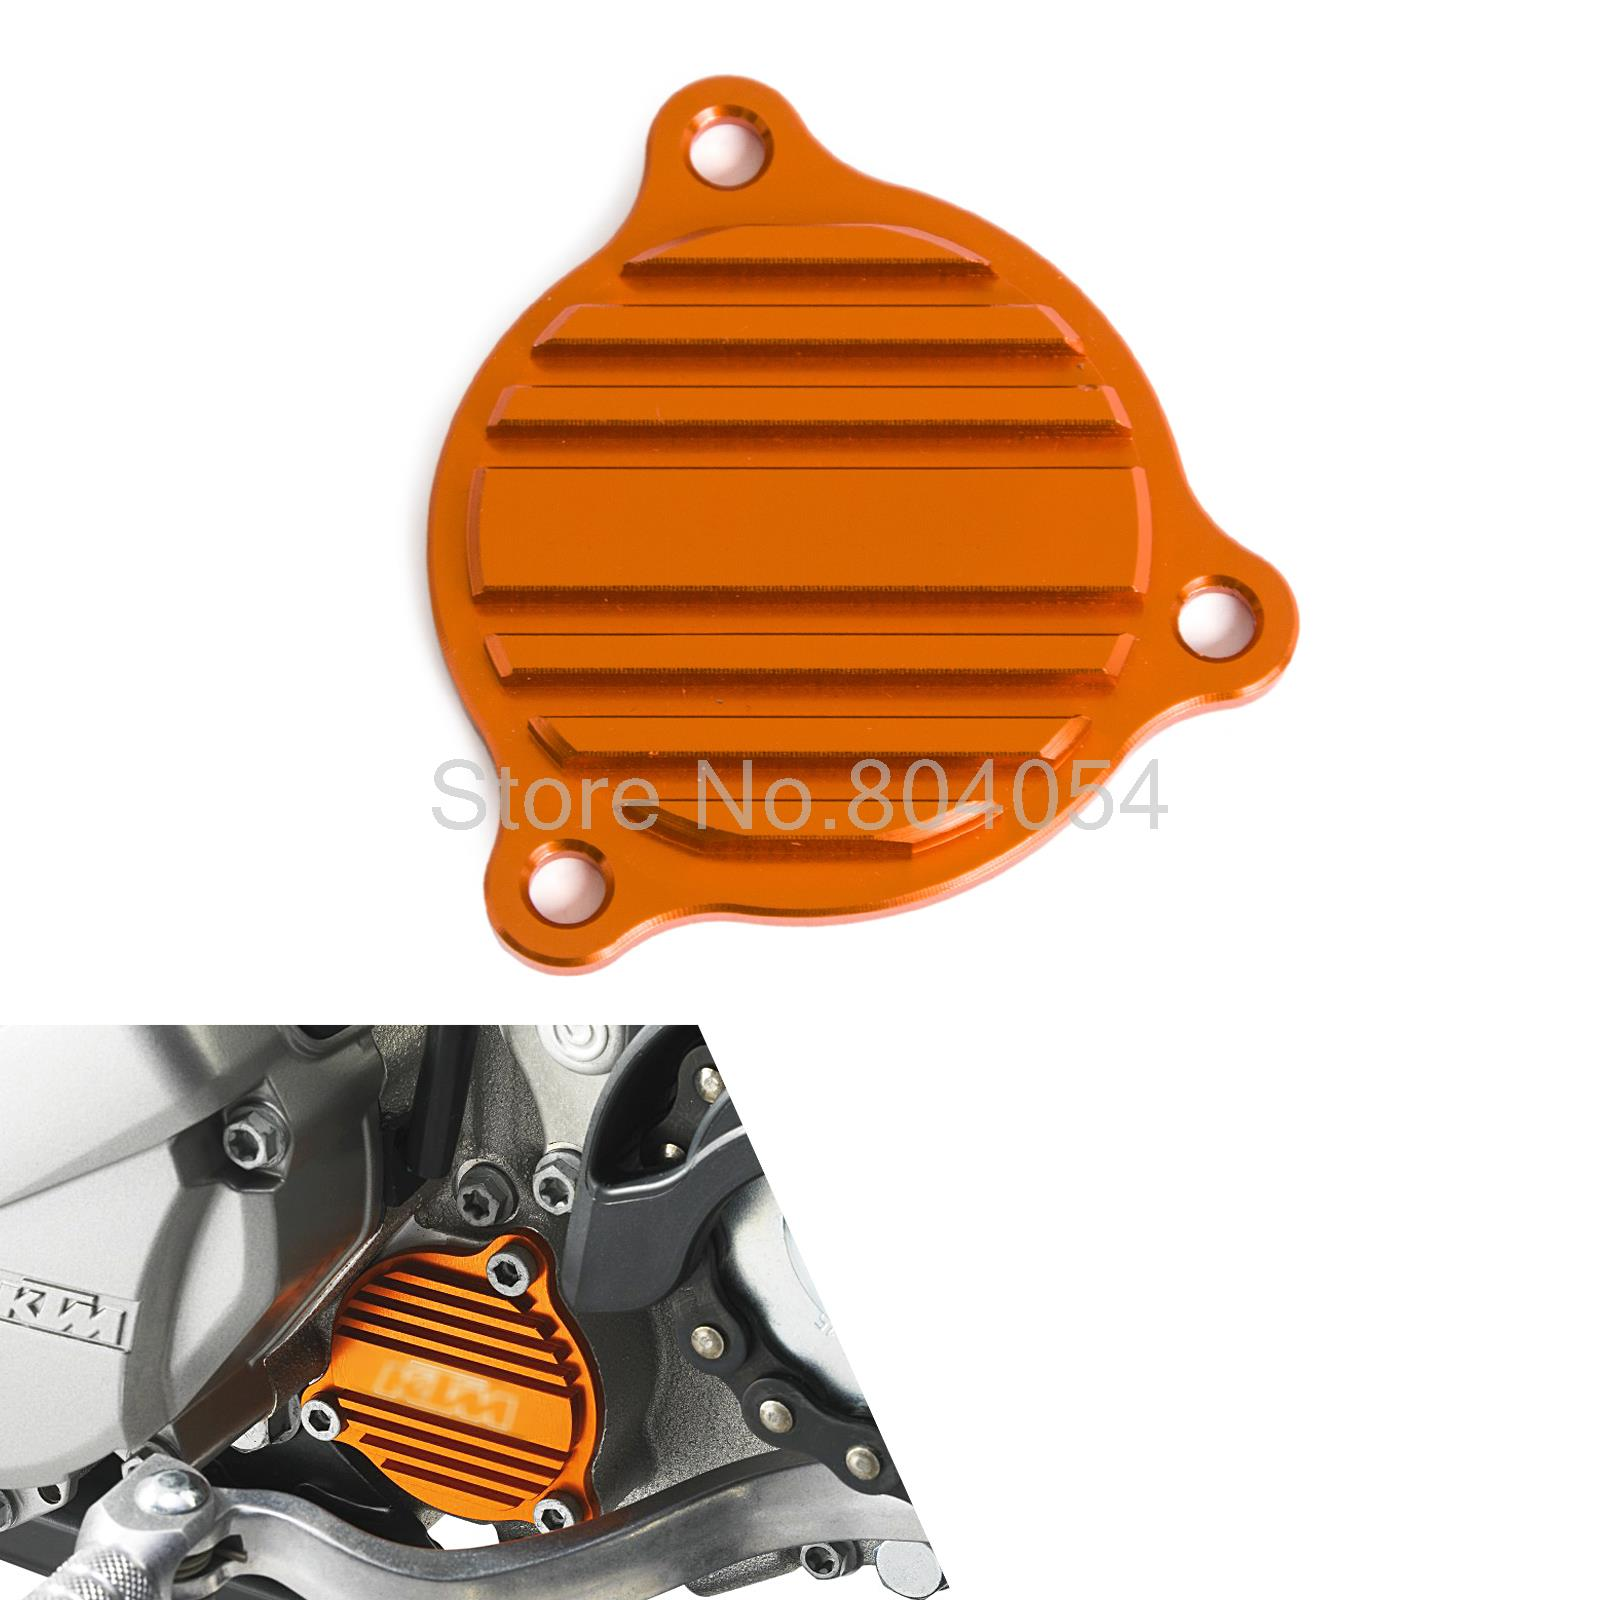 Oil Filter Cover for KTM 250 XCF-W 250 EXC-F SIX DAYS 350 XCF-W SIX DAYS 14-16<br><br>Aliexpress